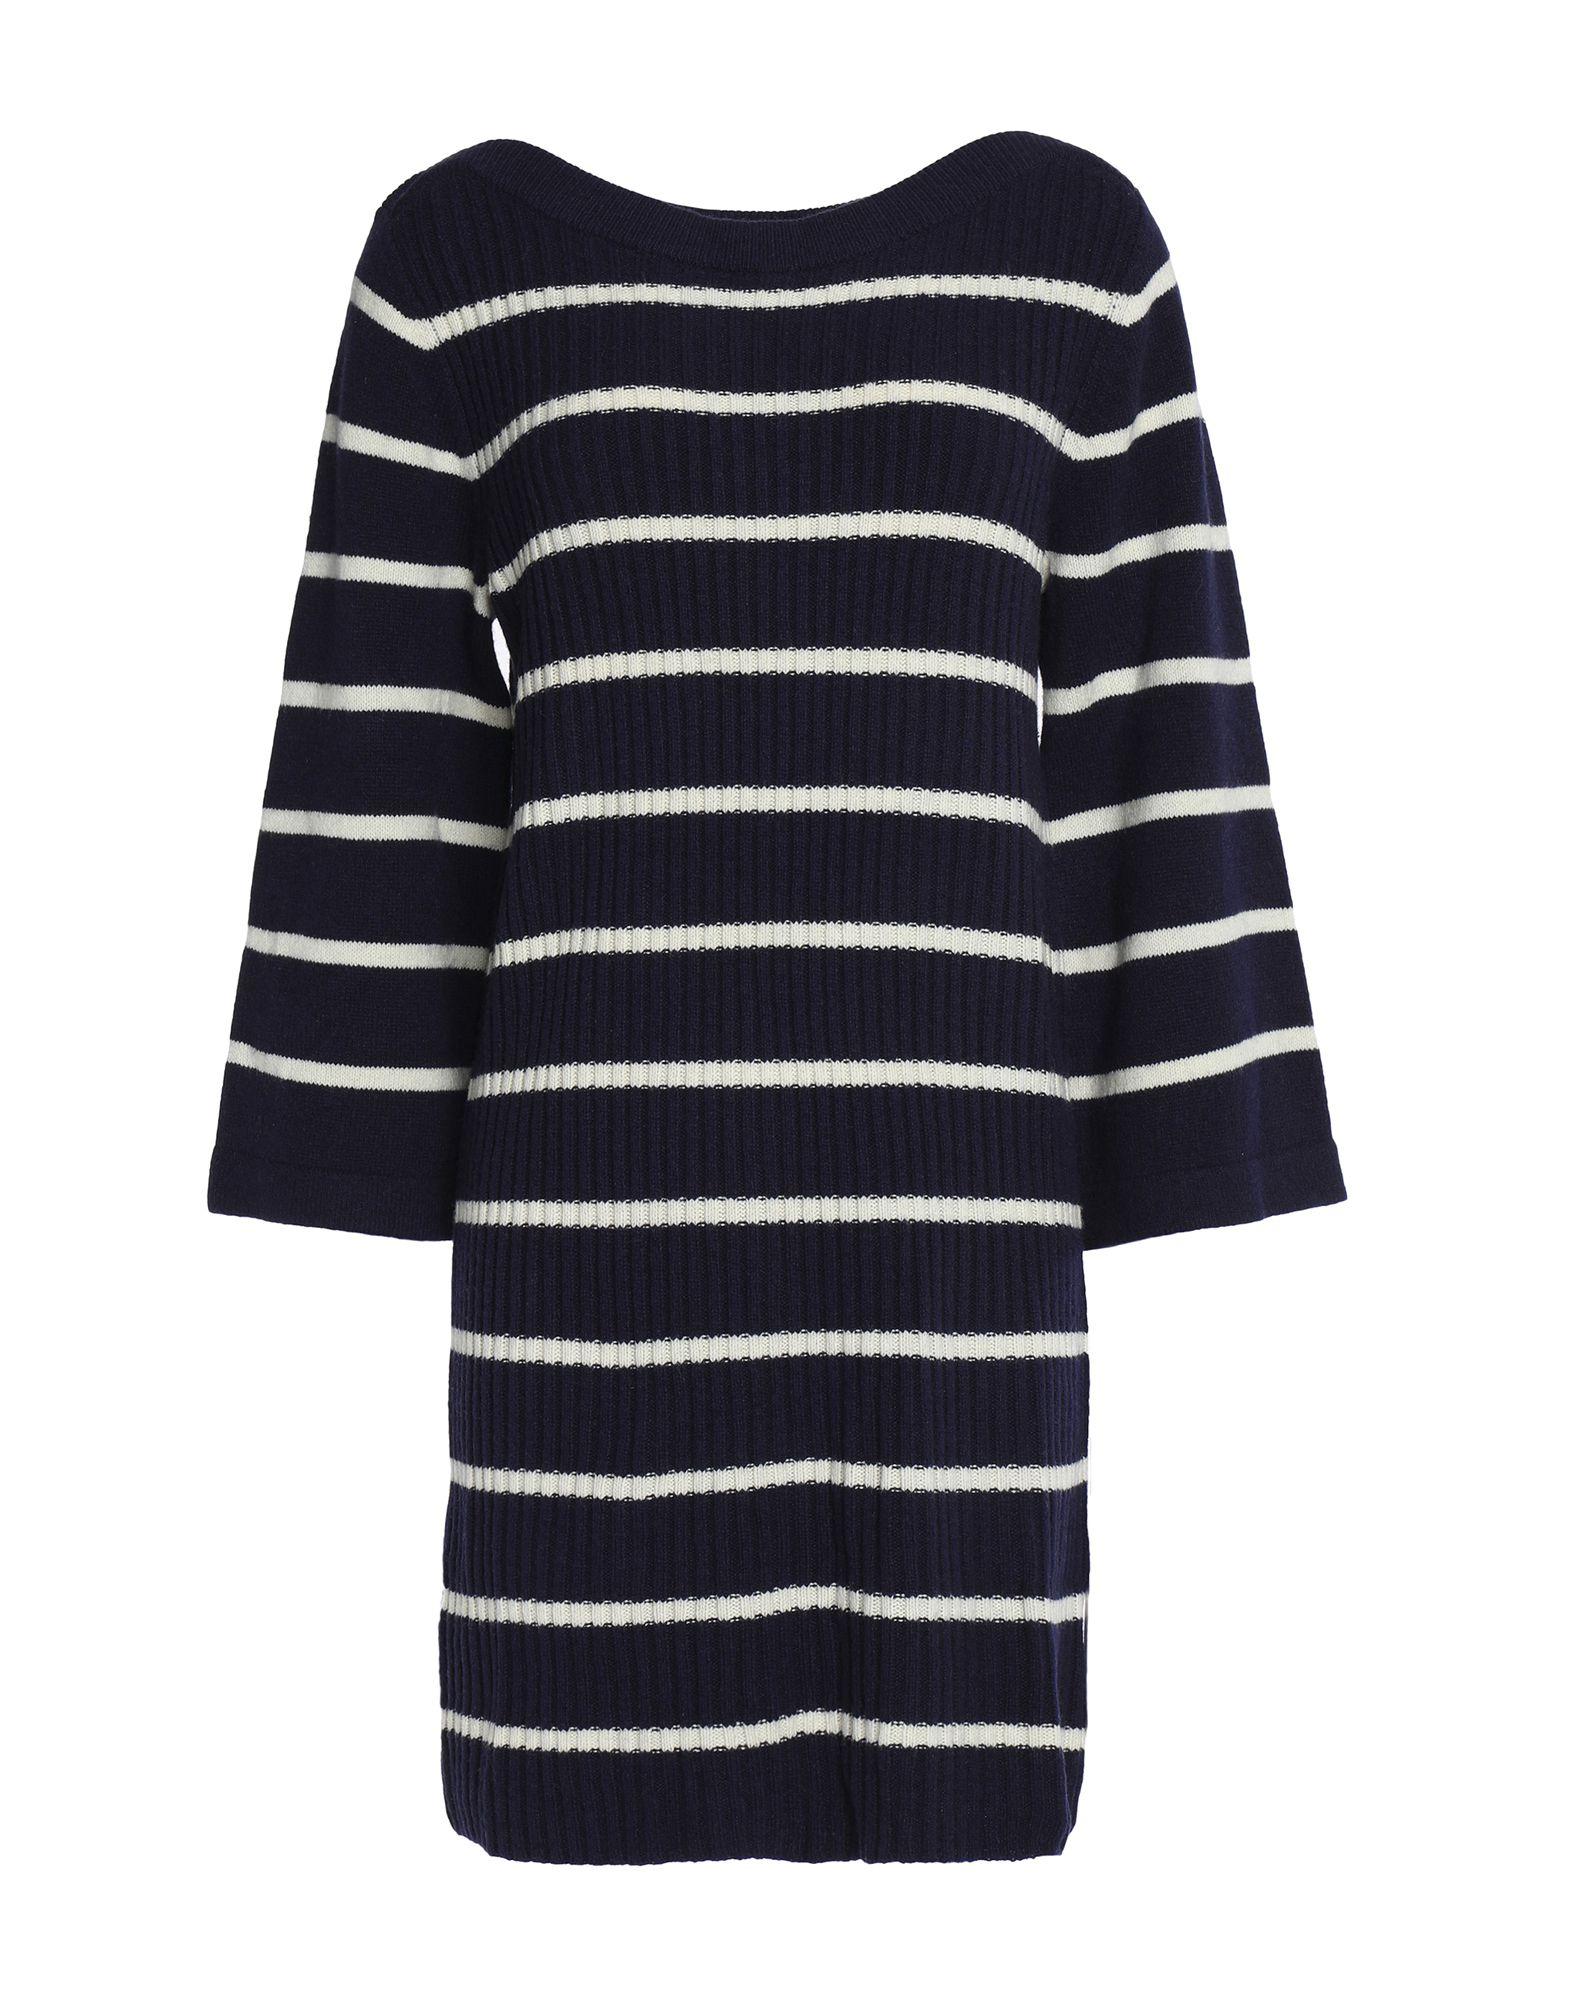 bd74388874 Ganni Knit Dress - Women Ganni Knit Dresses online on YOOX United ...